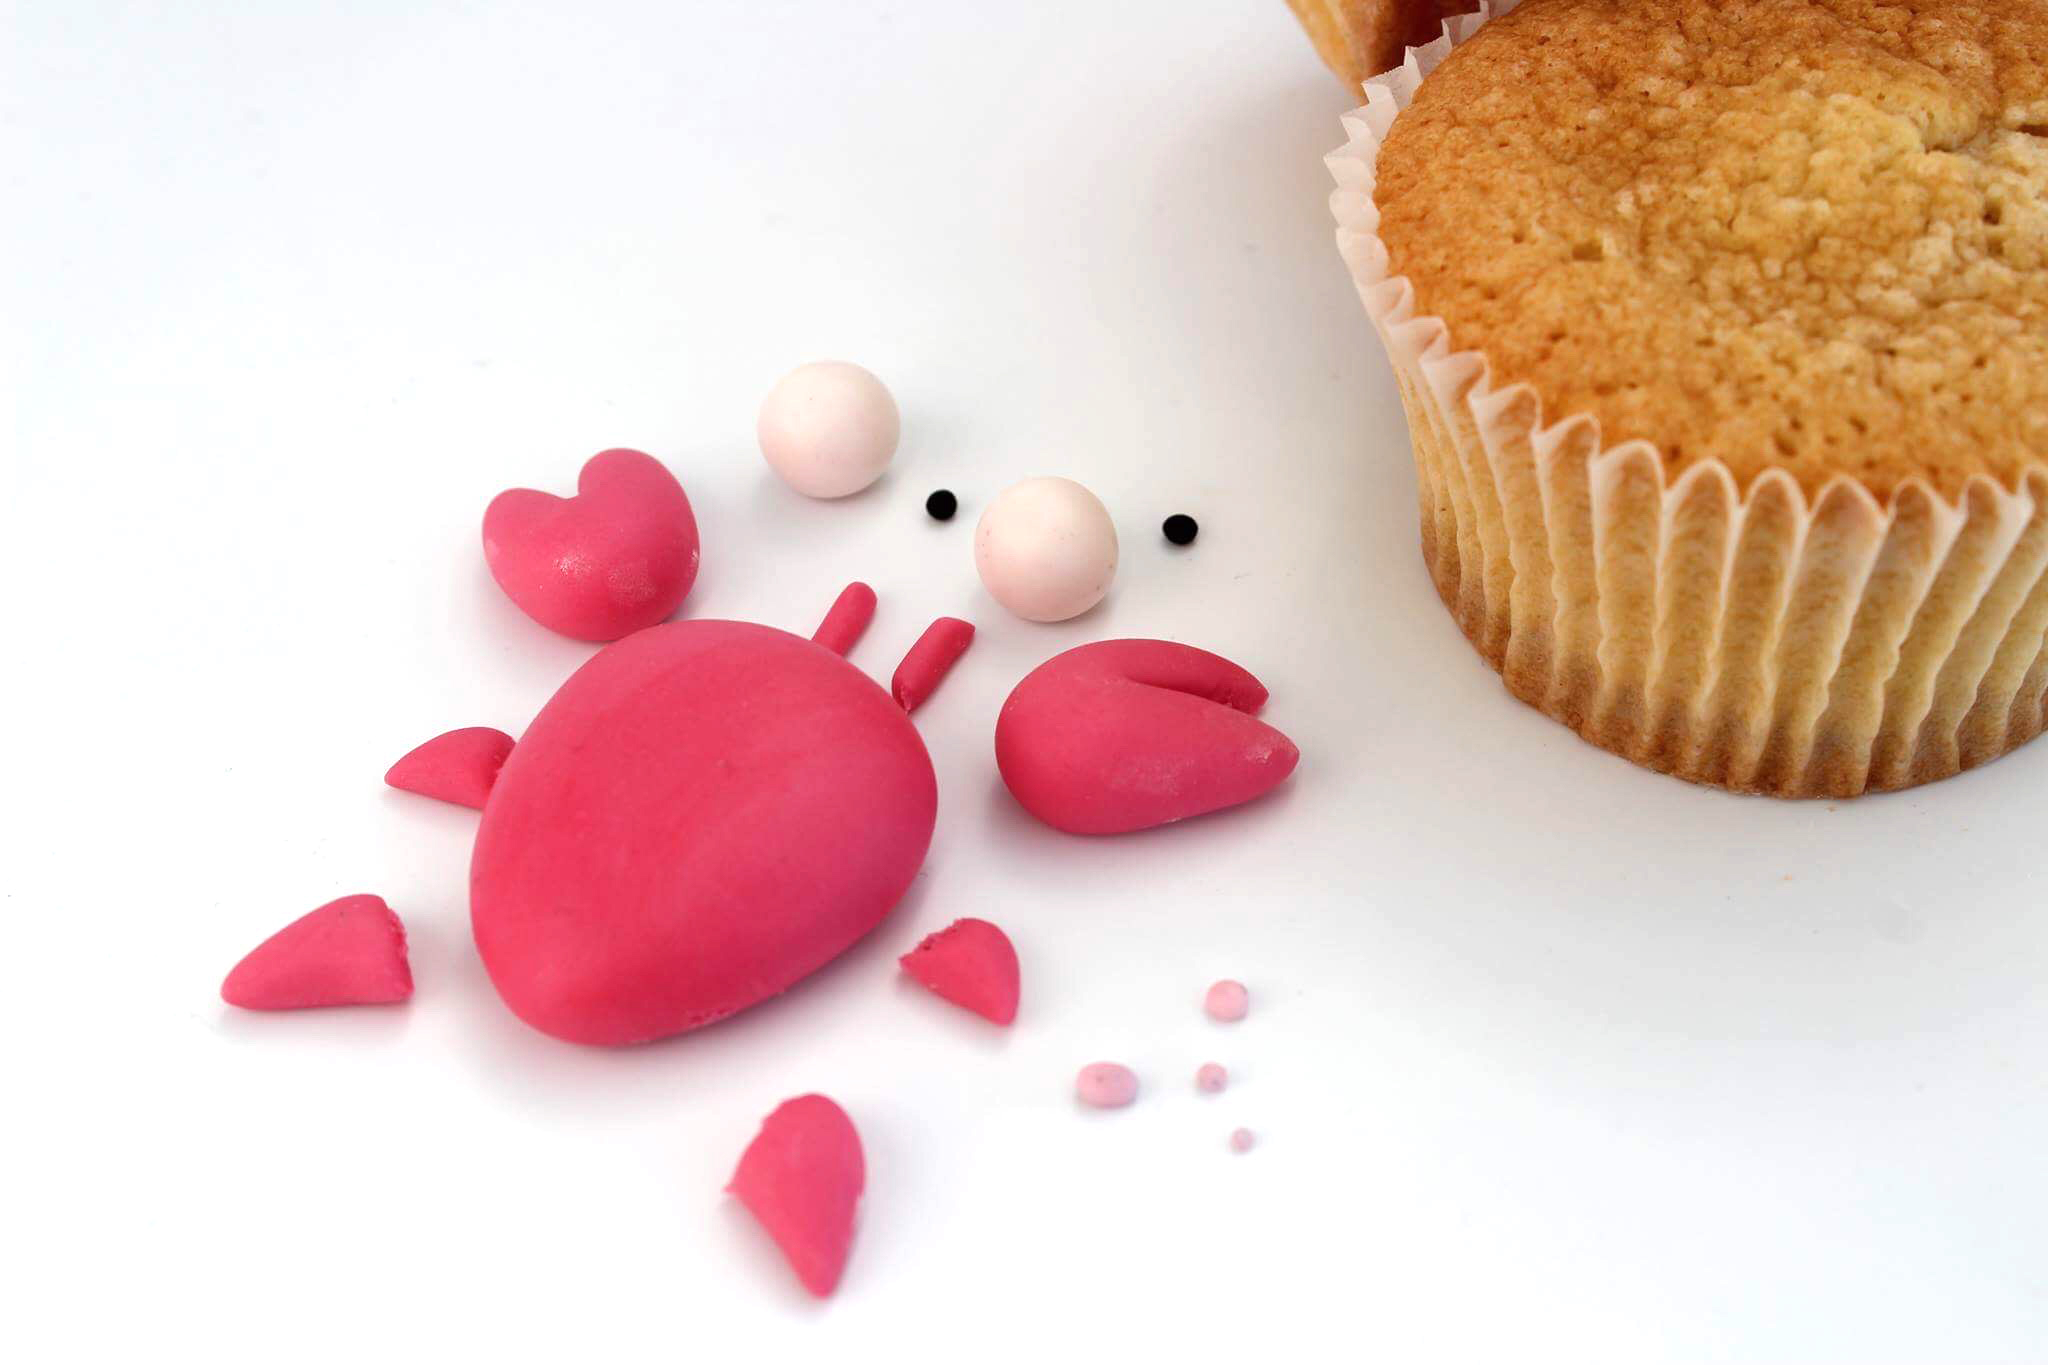 sff17_CrabTutorial-Monique-Ascanelli-The-Cake-Topper-Pieces1.JPG#asset:17070